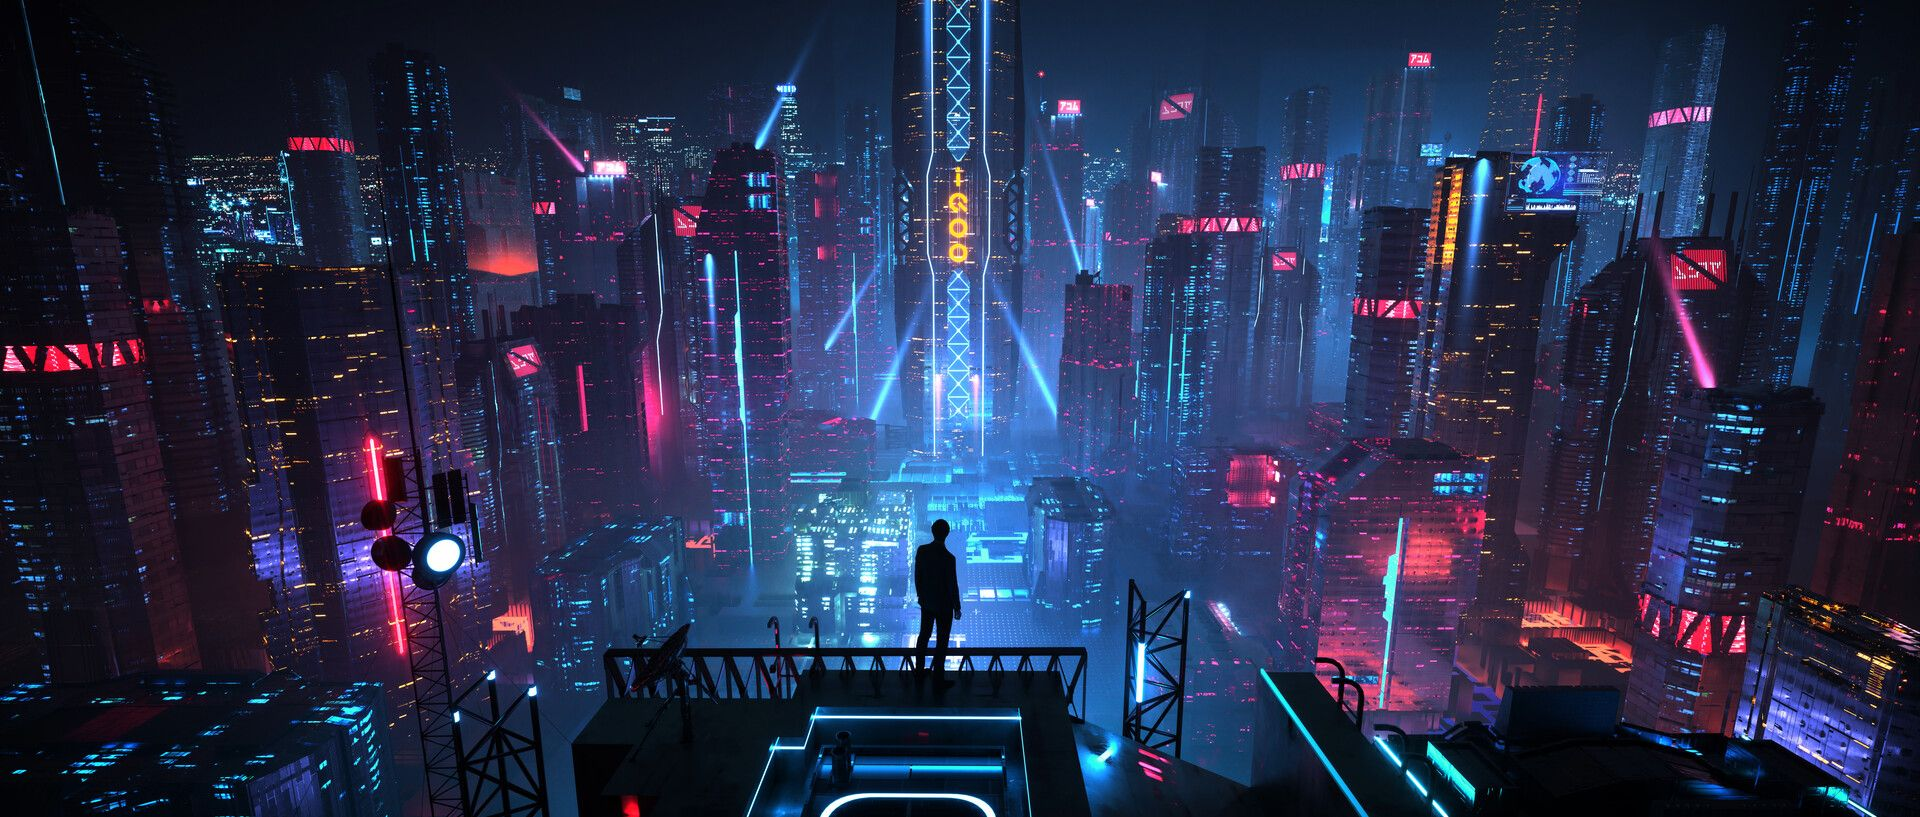 Artstation Iqoo Style Frame And Scene Design Xuteng Pan Cyberpunk City Futuristic City City Wallpaper